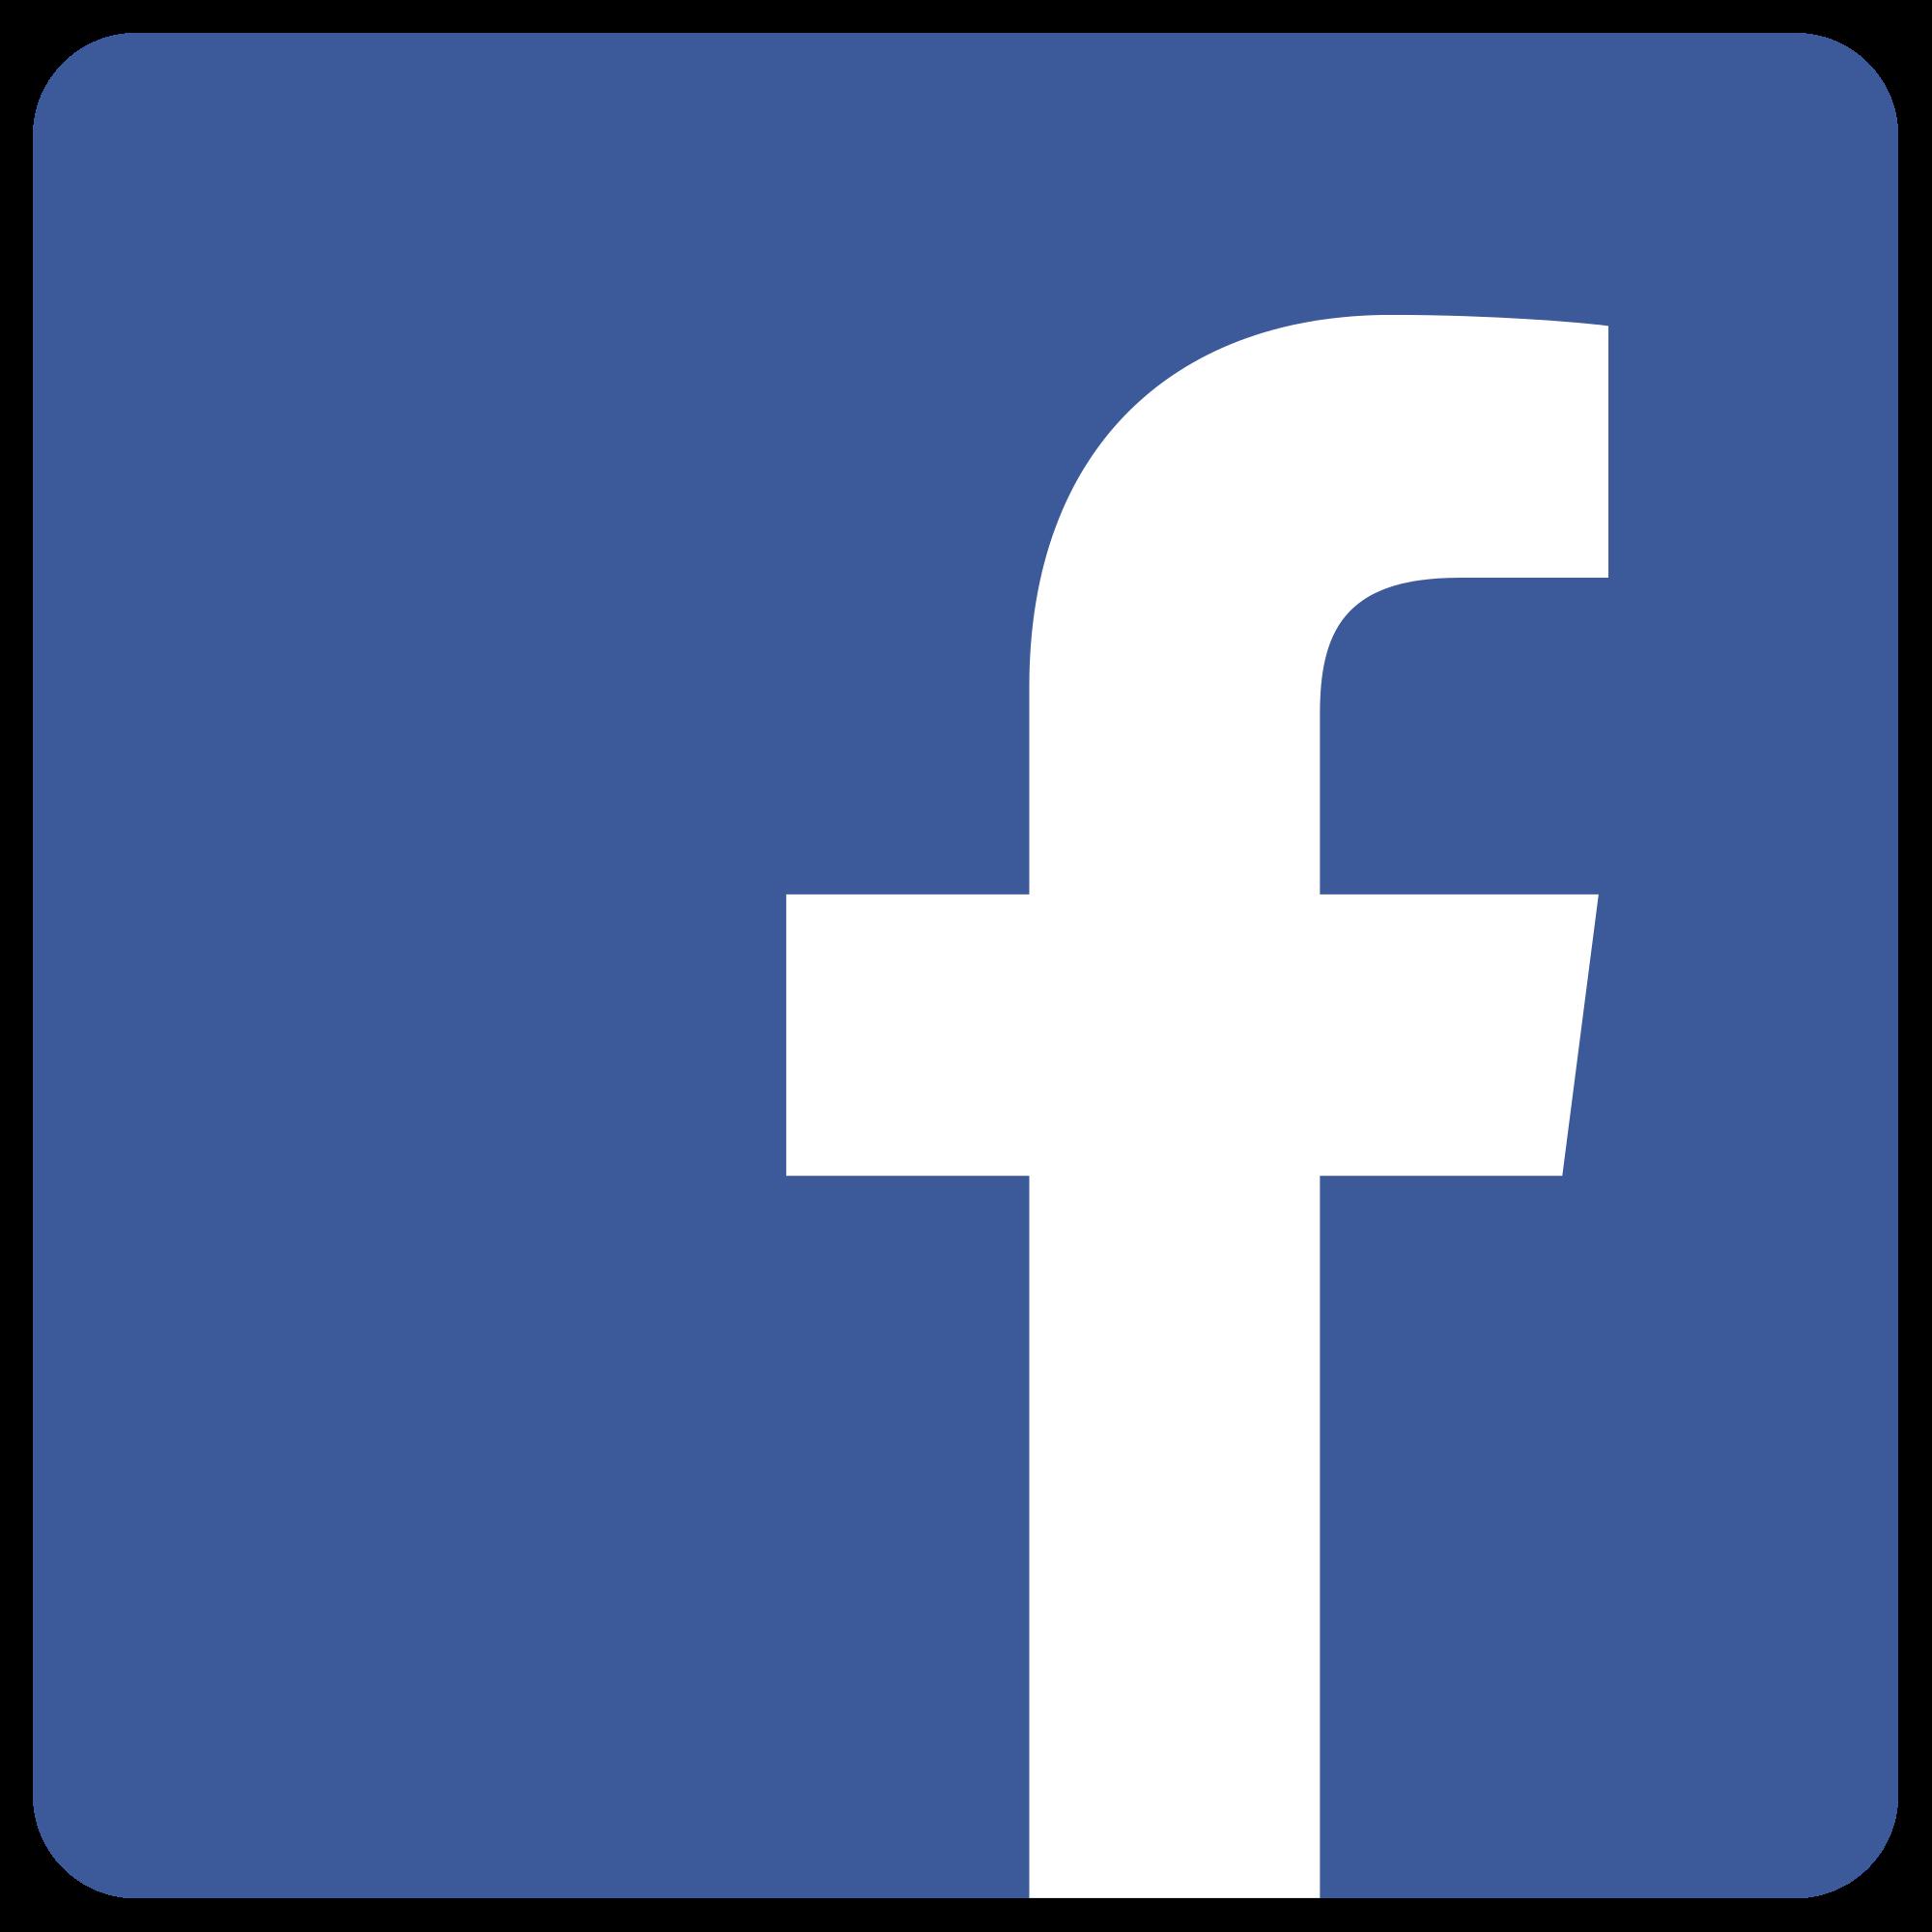 ECAI 2016 Facebook